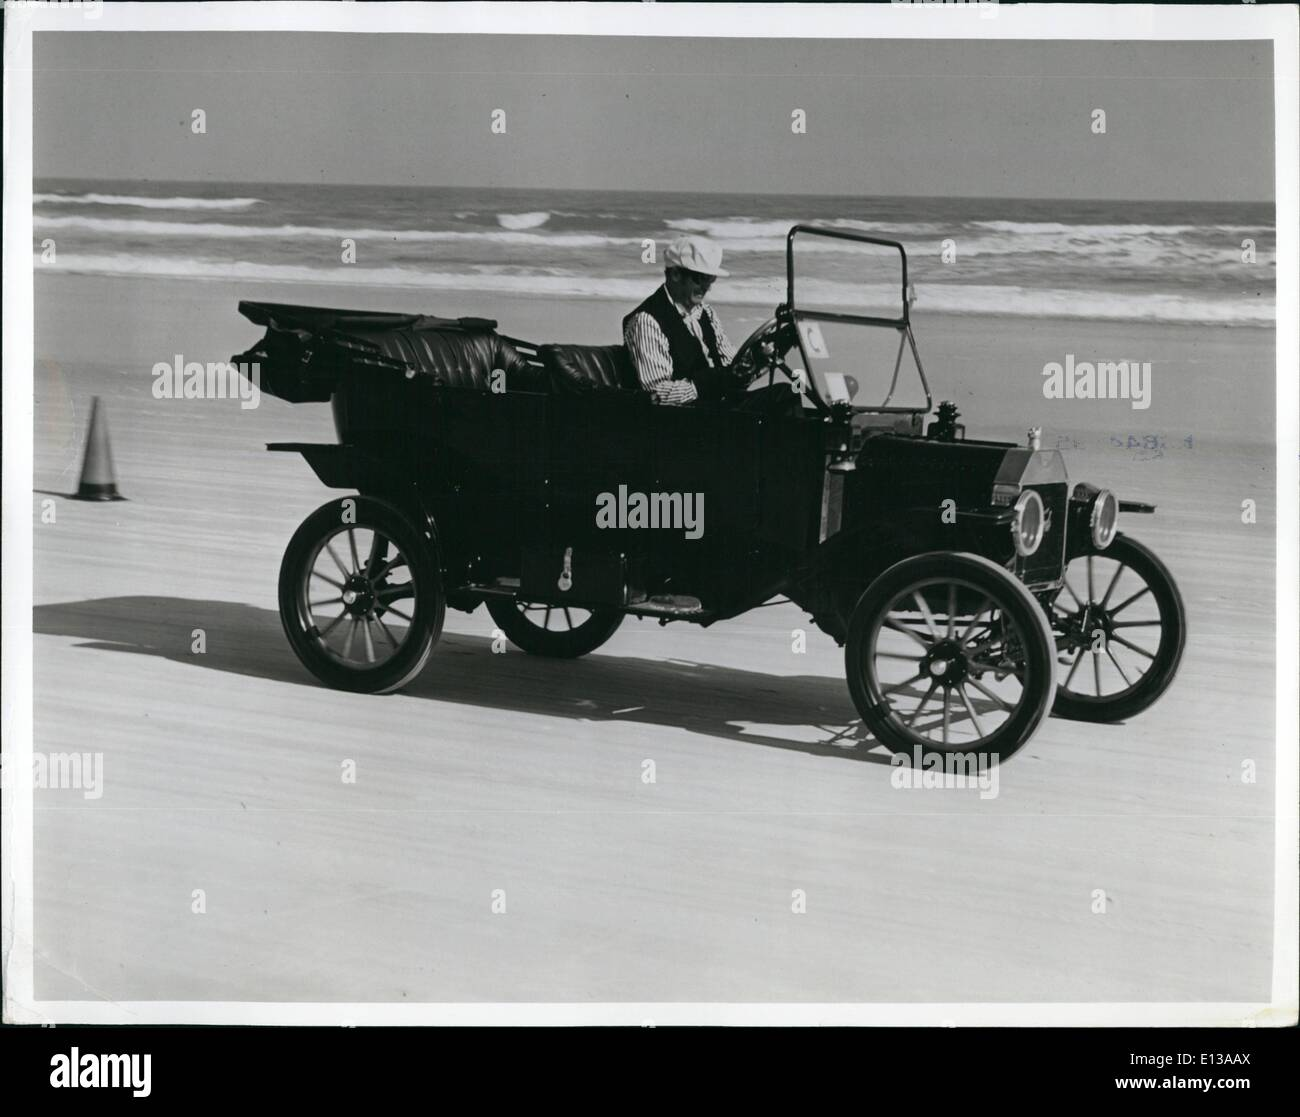 Vintage Autos Stock Photos & Vintage Autos Stock Images - Alamy